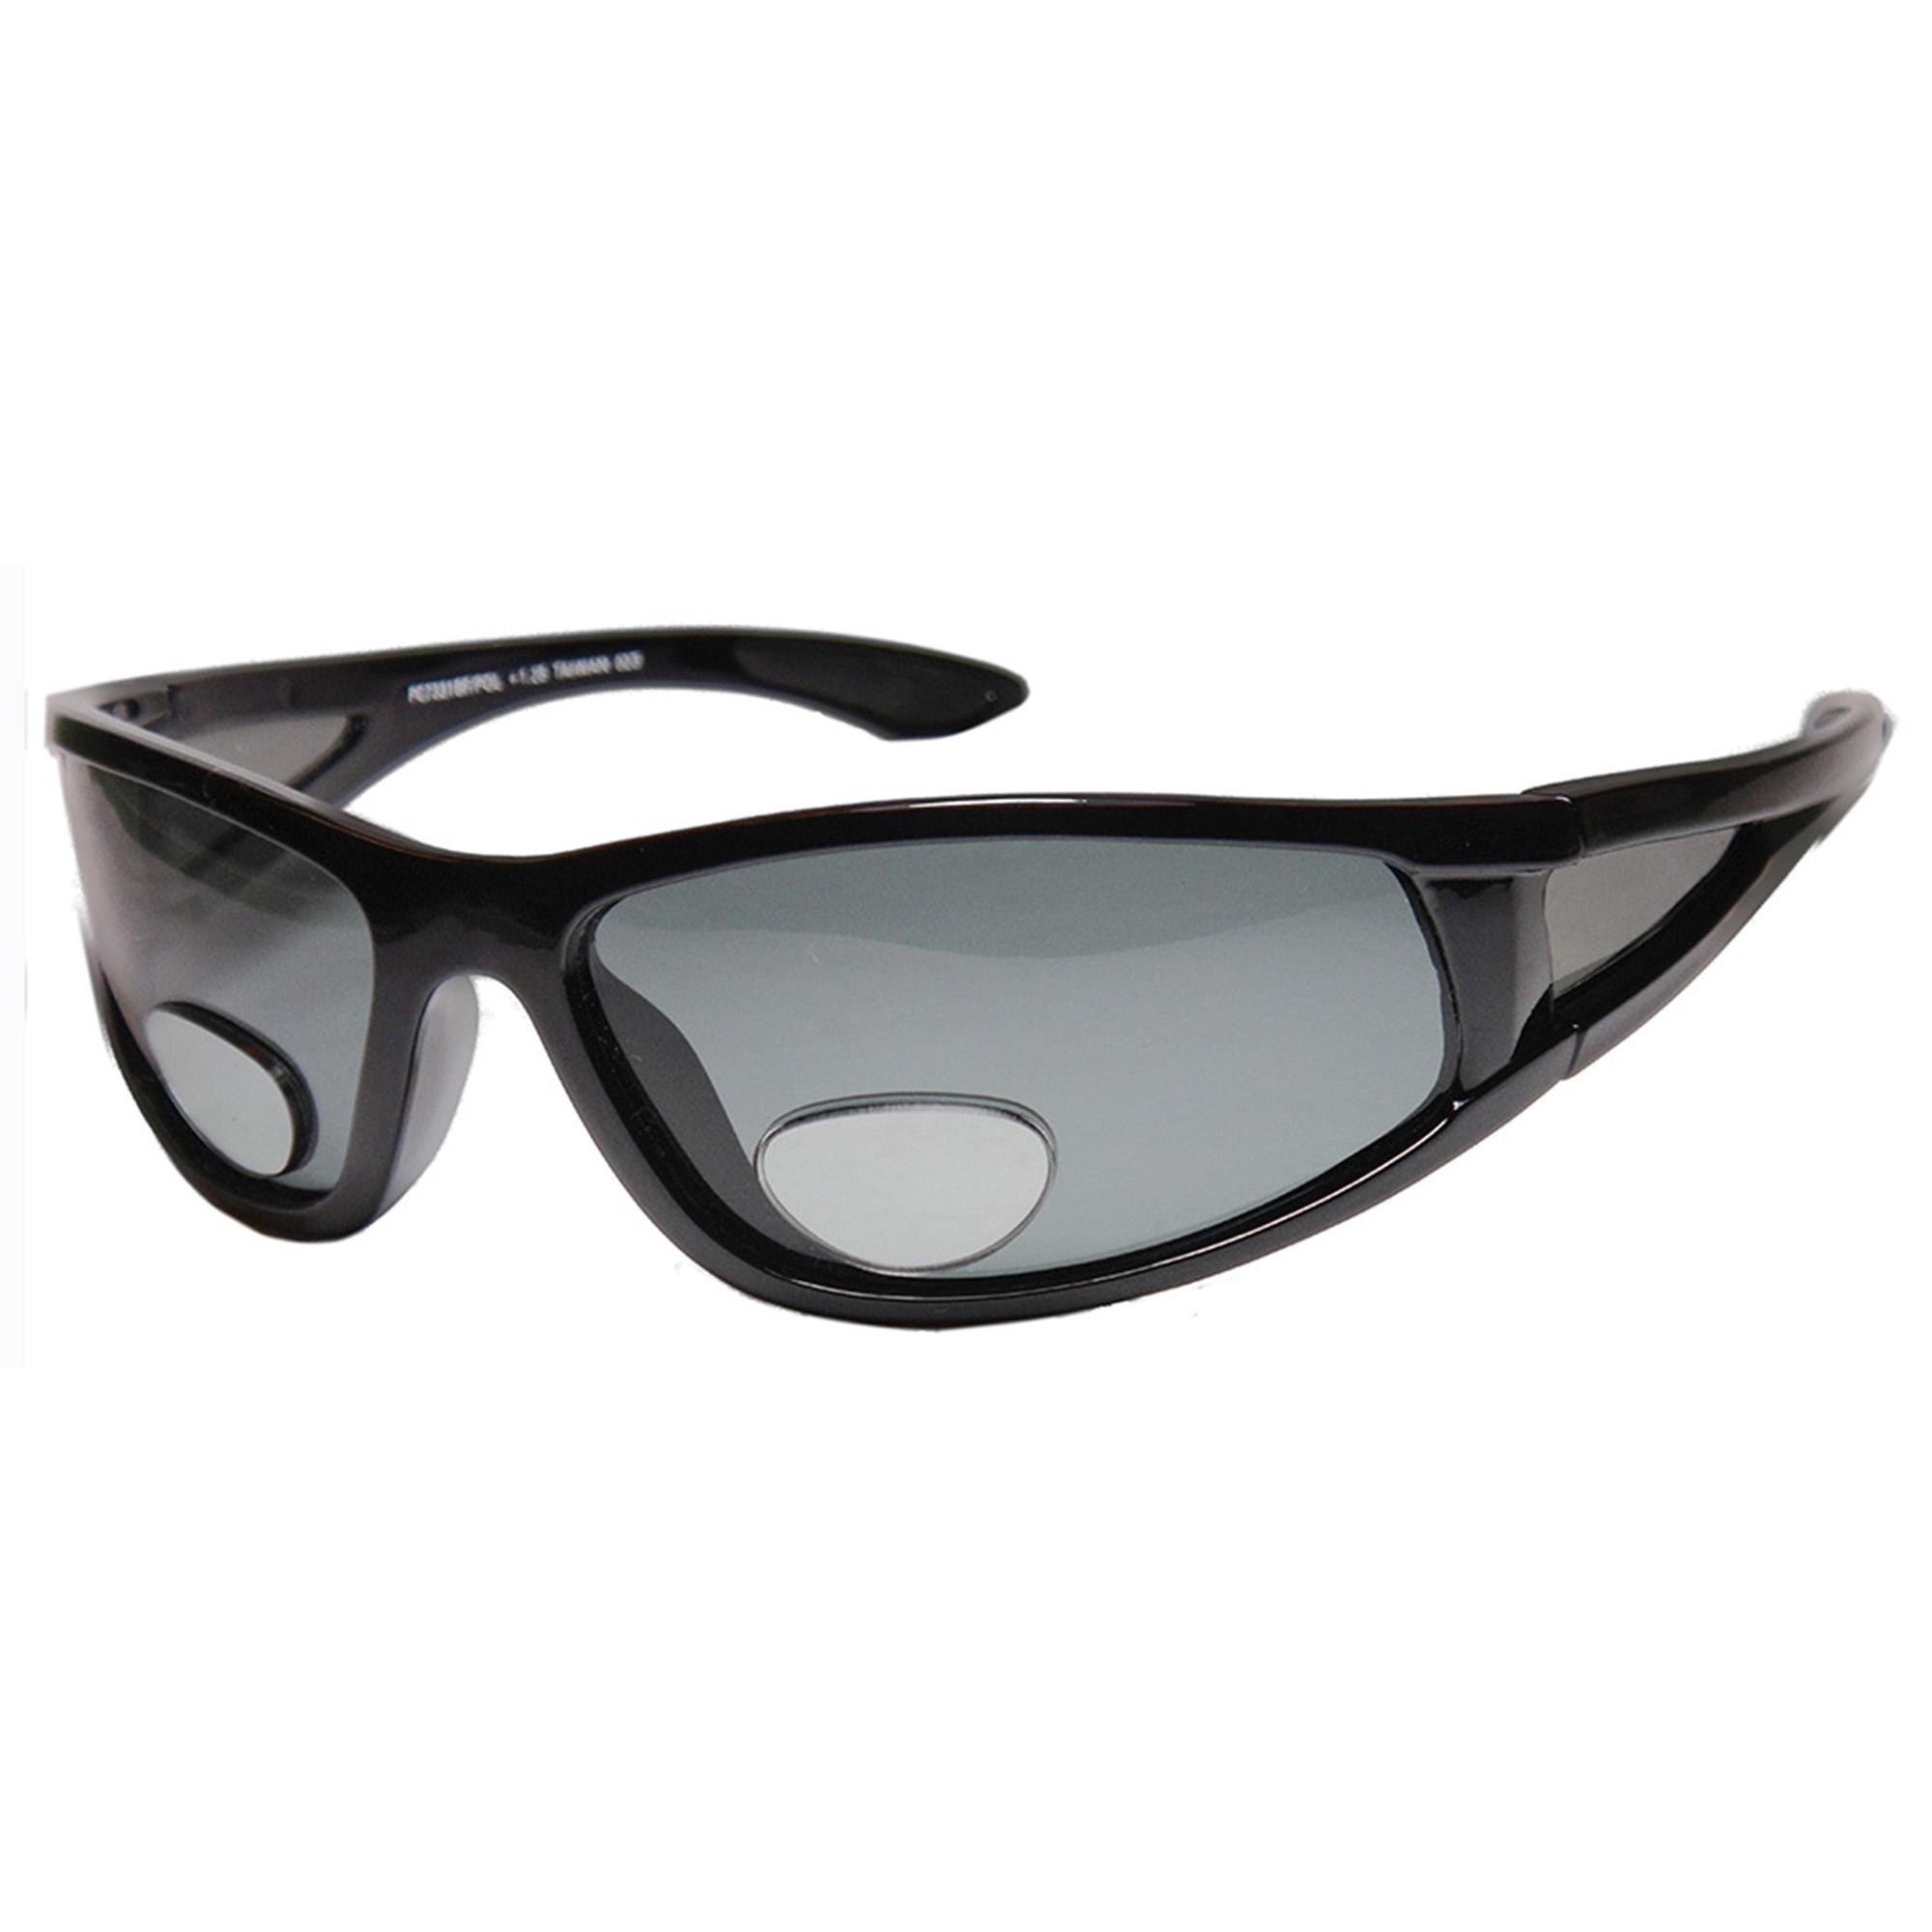 Glasslane Mens Sports Wrap Around Sunglasses Polarized Bifocal Lens Fly FishingBLACK +2.00